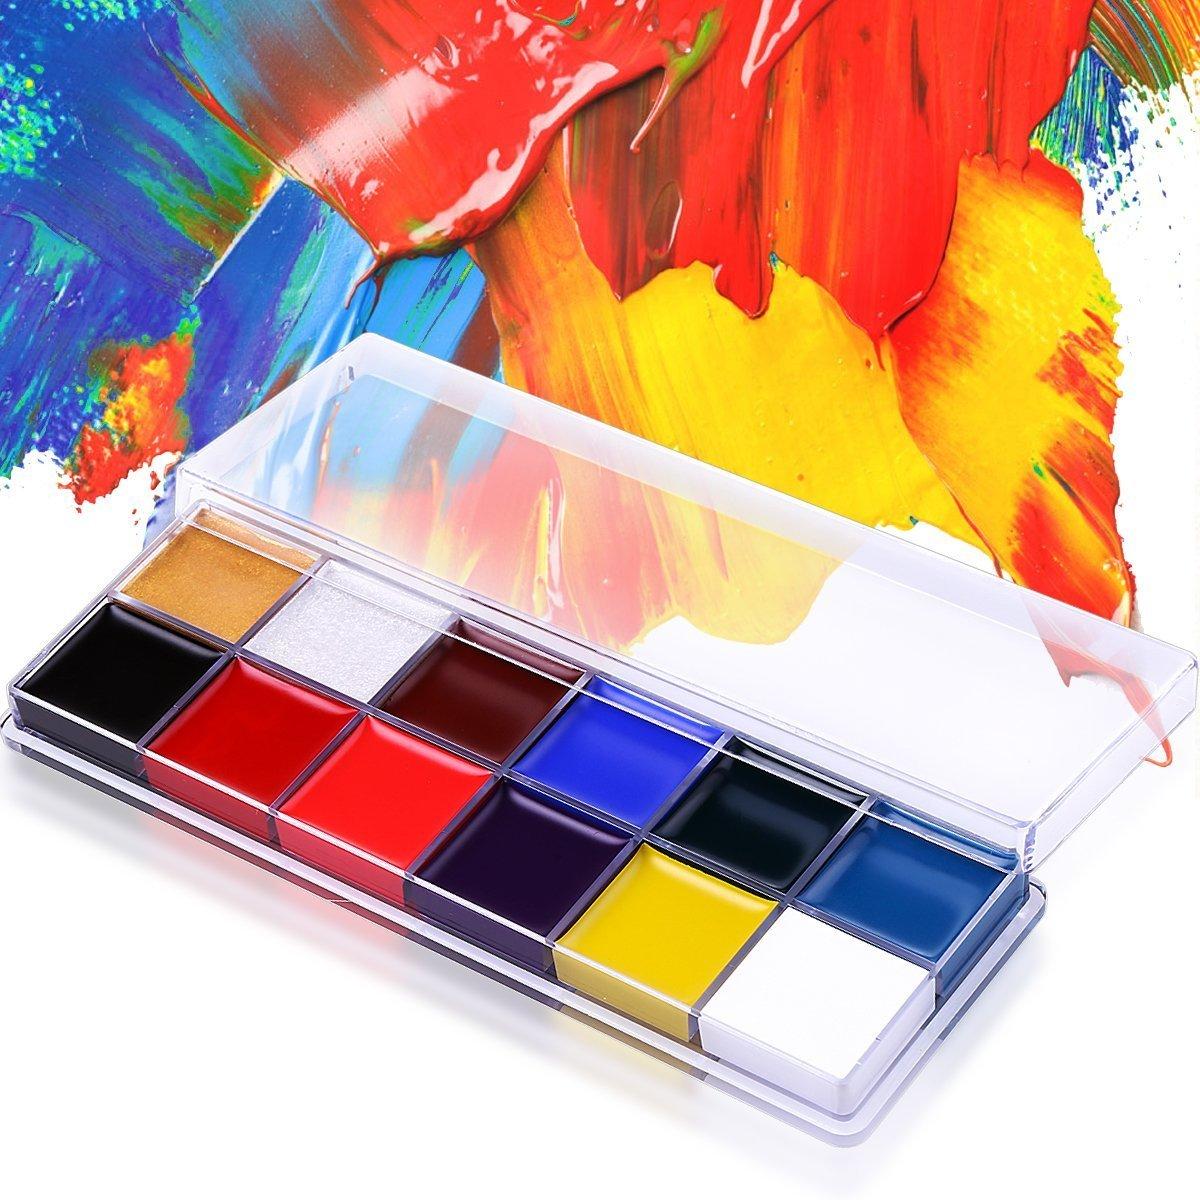 DONGXIUB Naked Body Paint 12 Colors Face Painting Makeup Kit Oil Art Painting Art Party Paint Set Make Up Palette